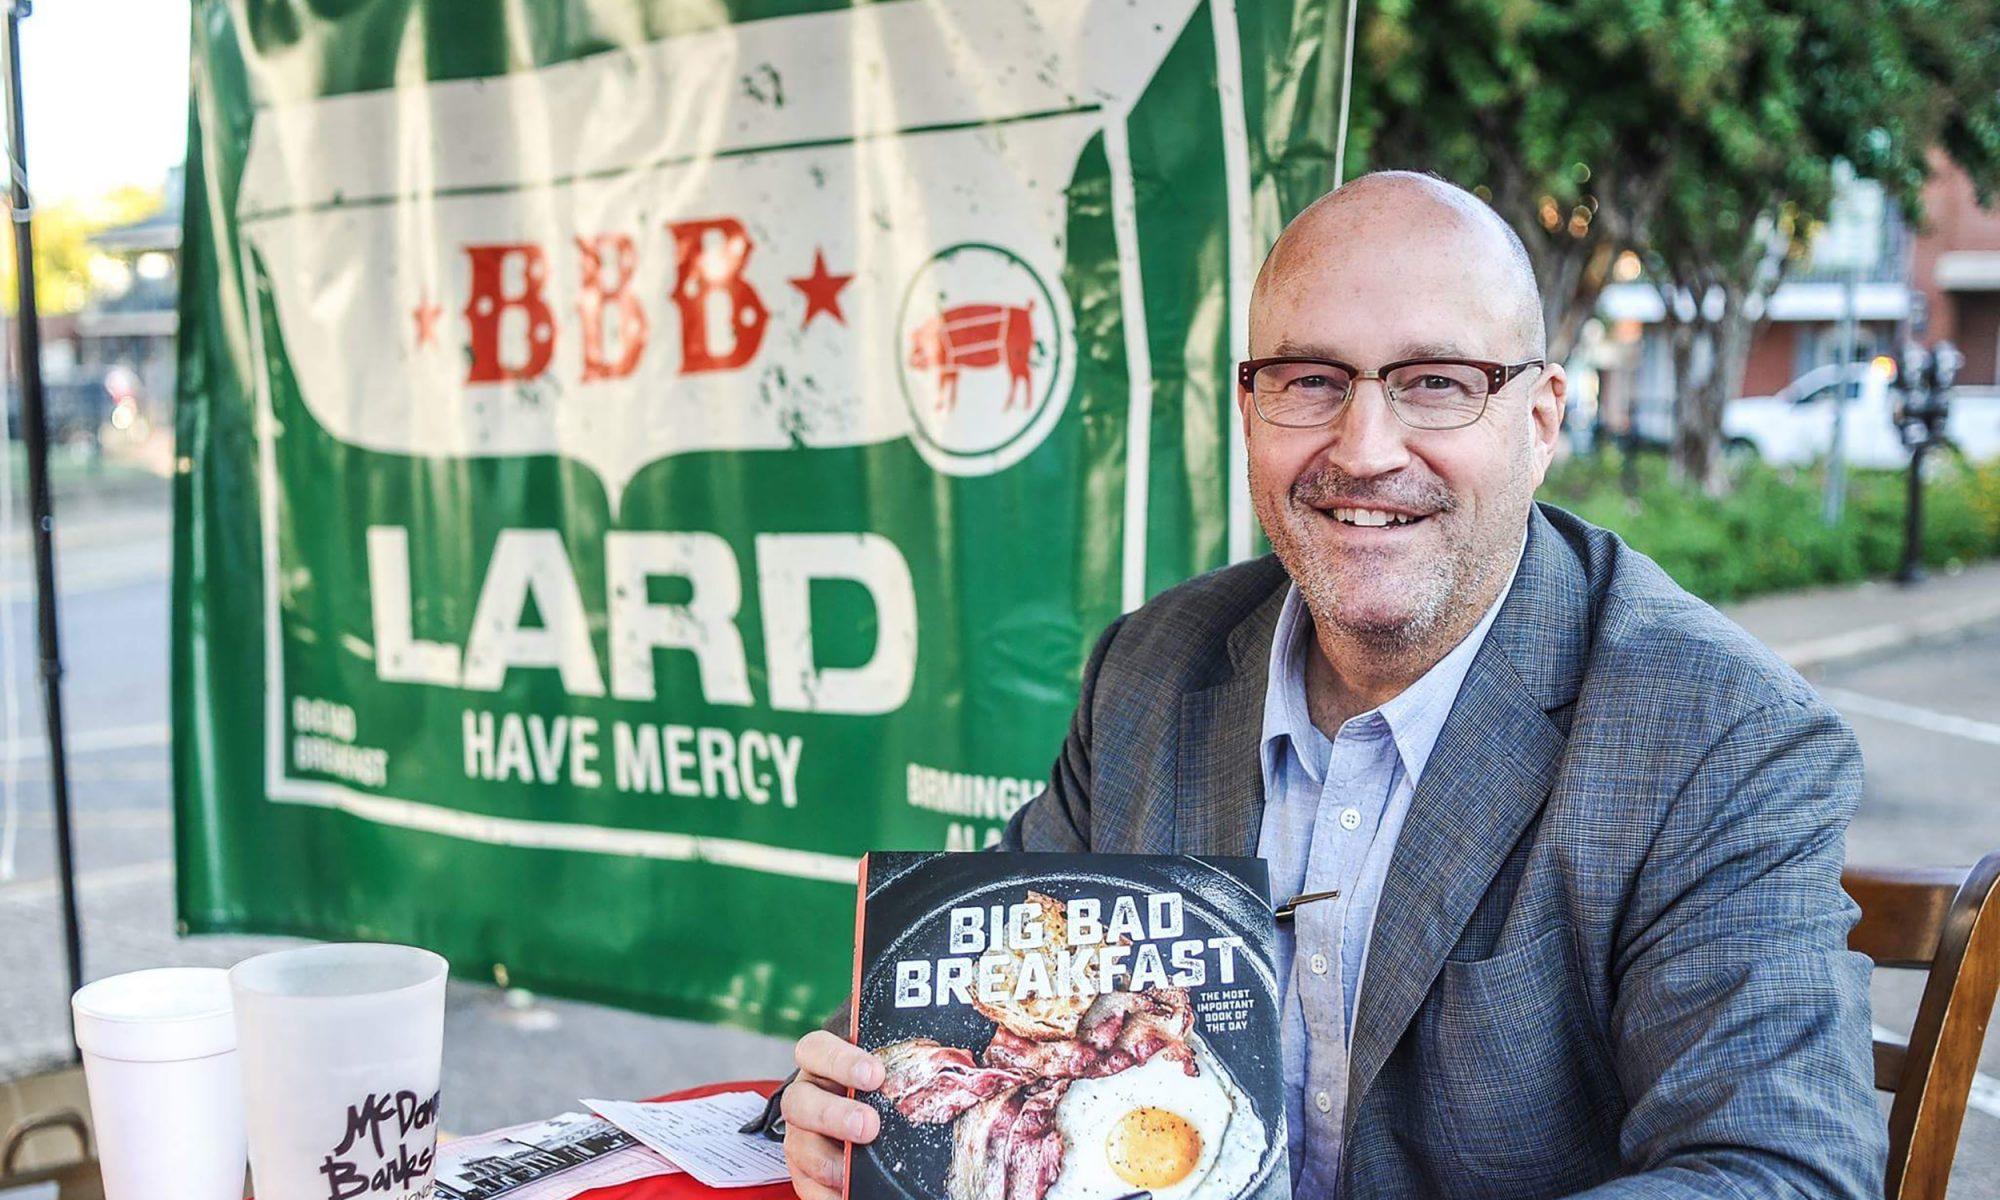 EC: The Biggest, Baddest, Best Breakfast Chef of 2016